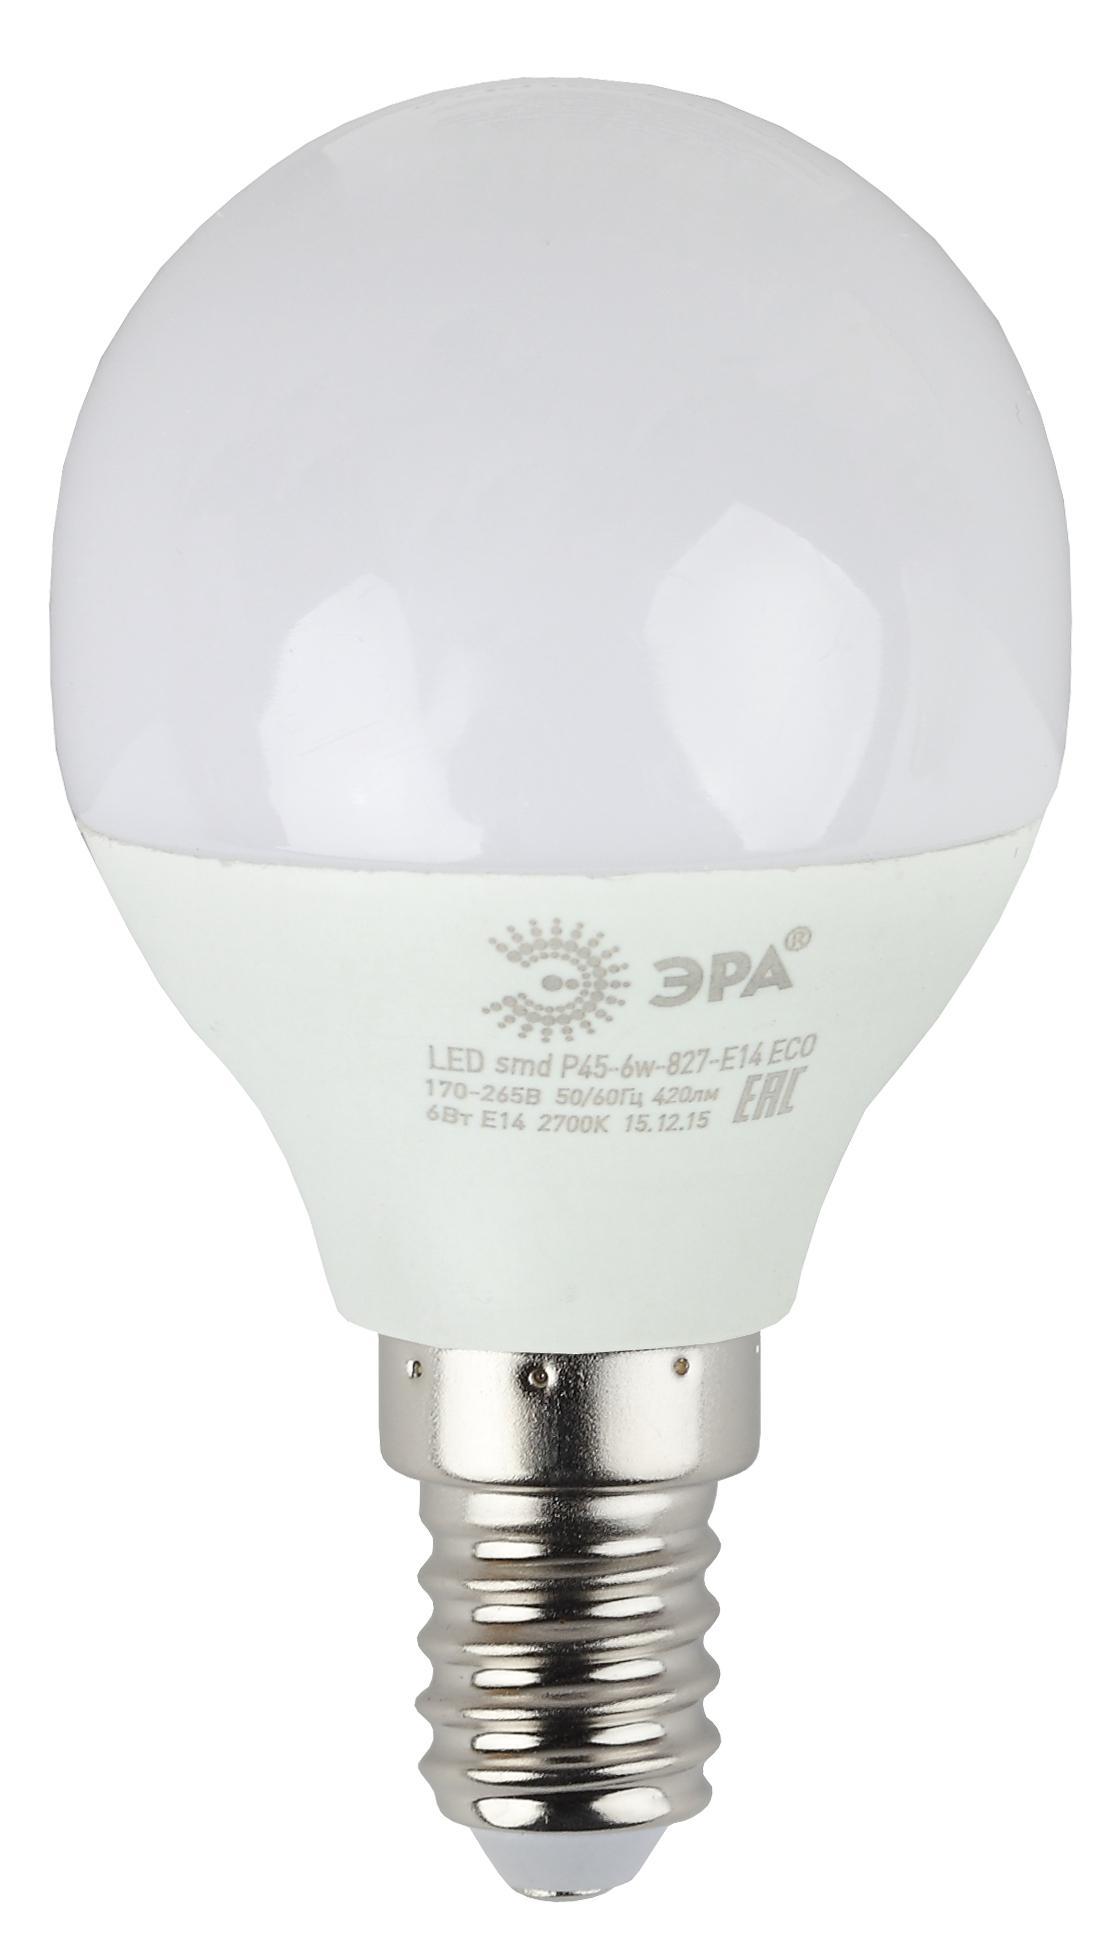 Лампа светодиодная ЭРА Led smd Р45-6w-827-e14 eco вентана граф технология 3 кл учебник издание 3